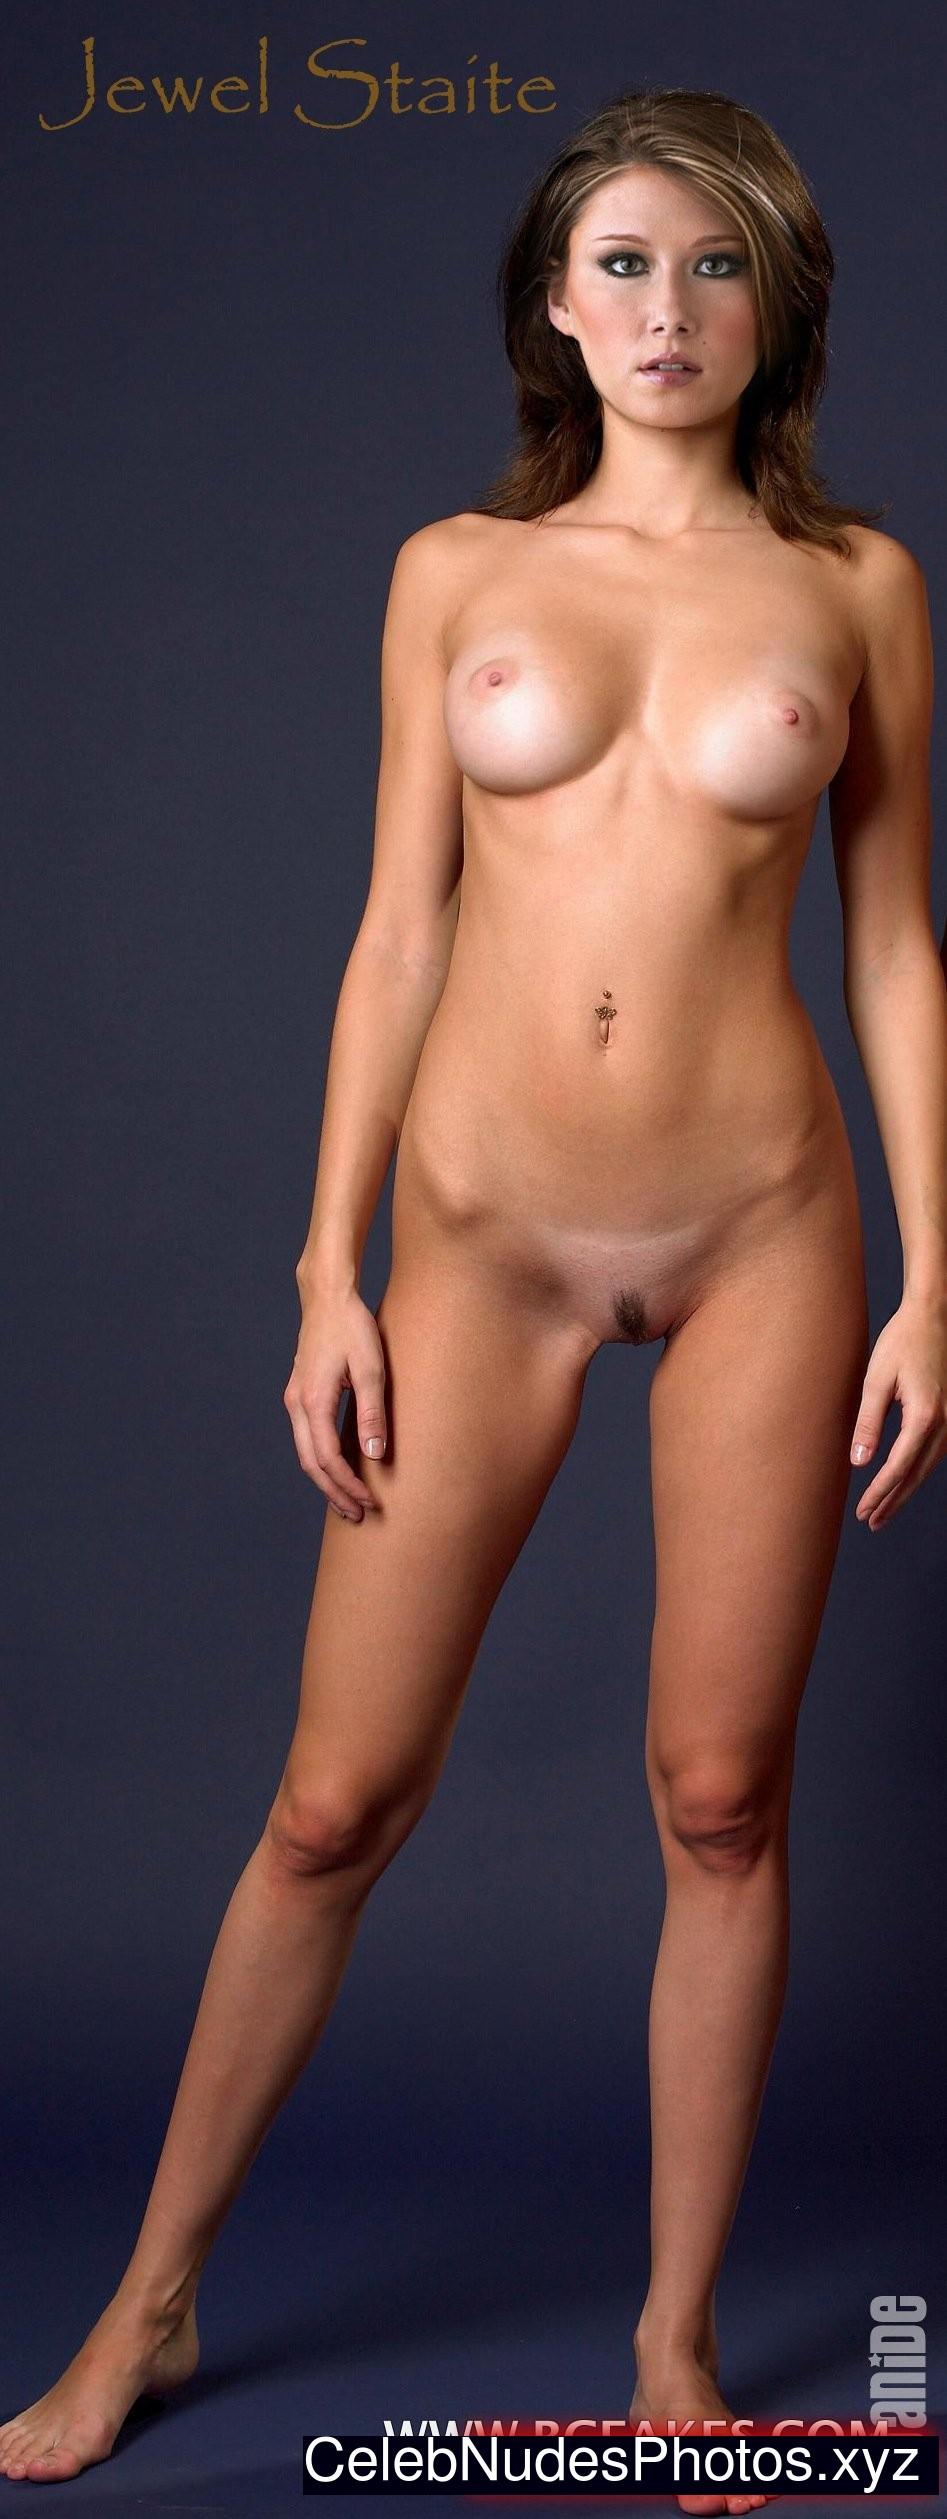 jewel staite nude pic